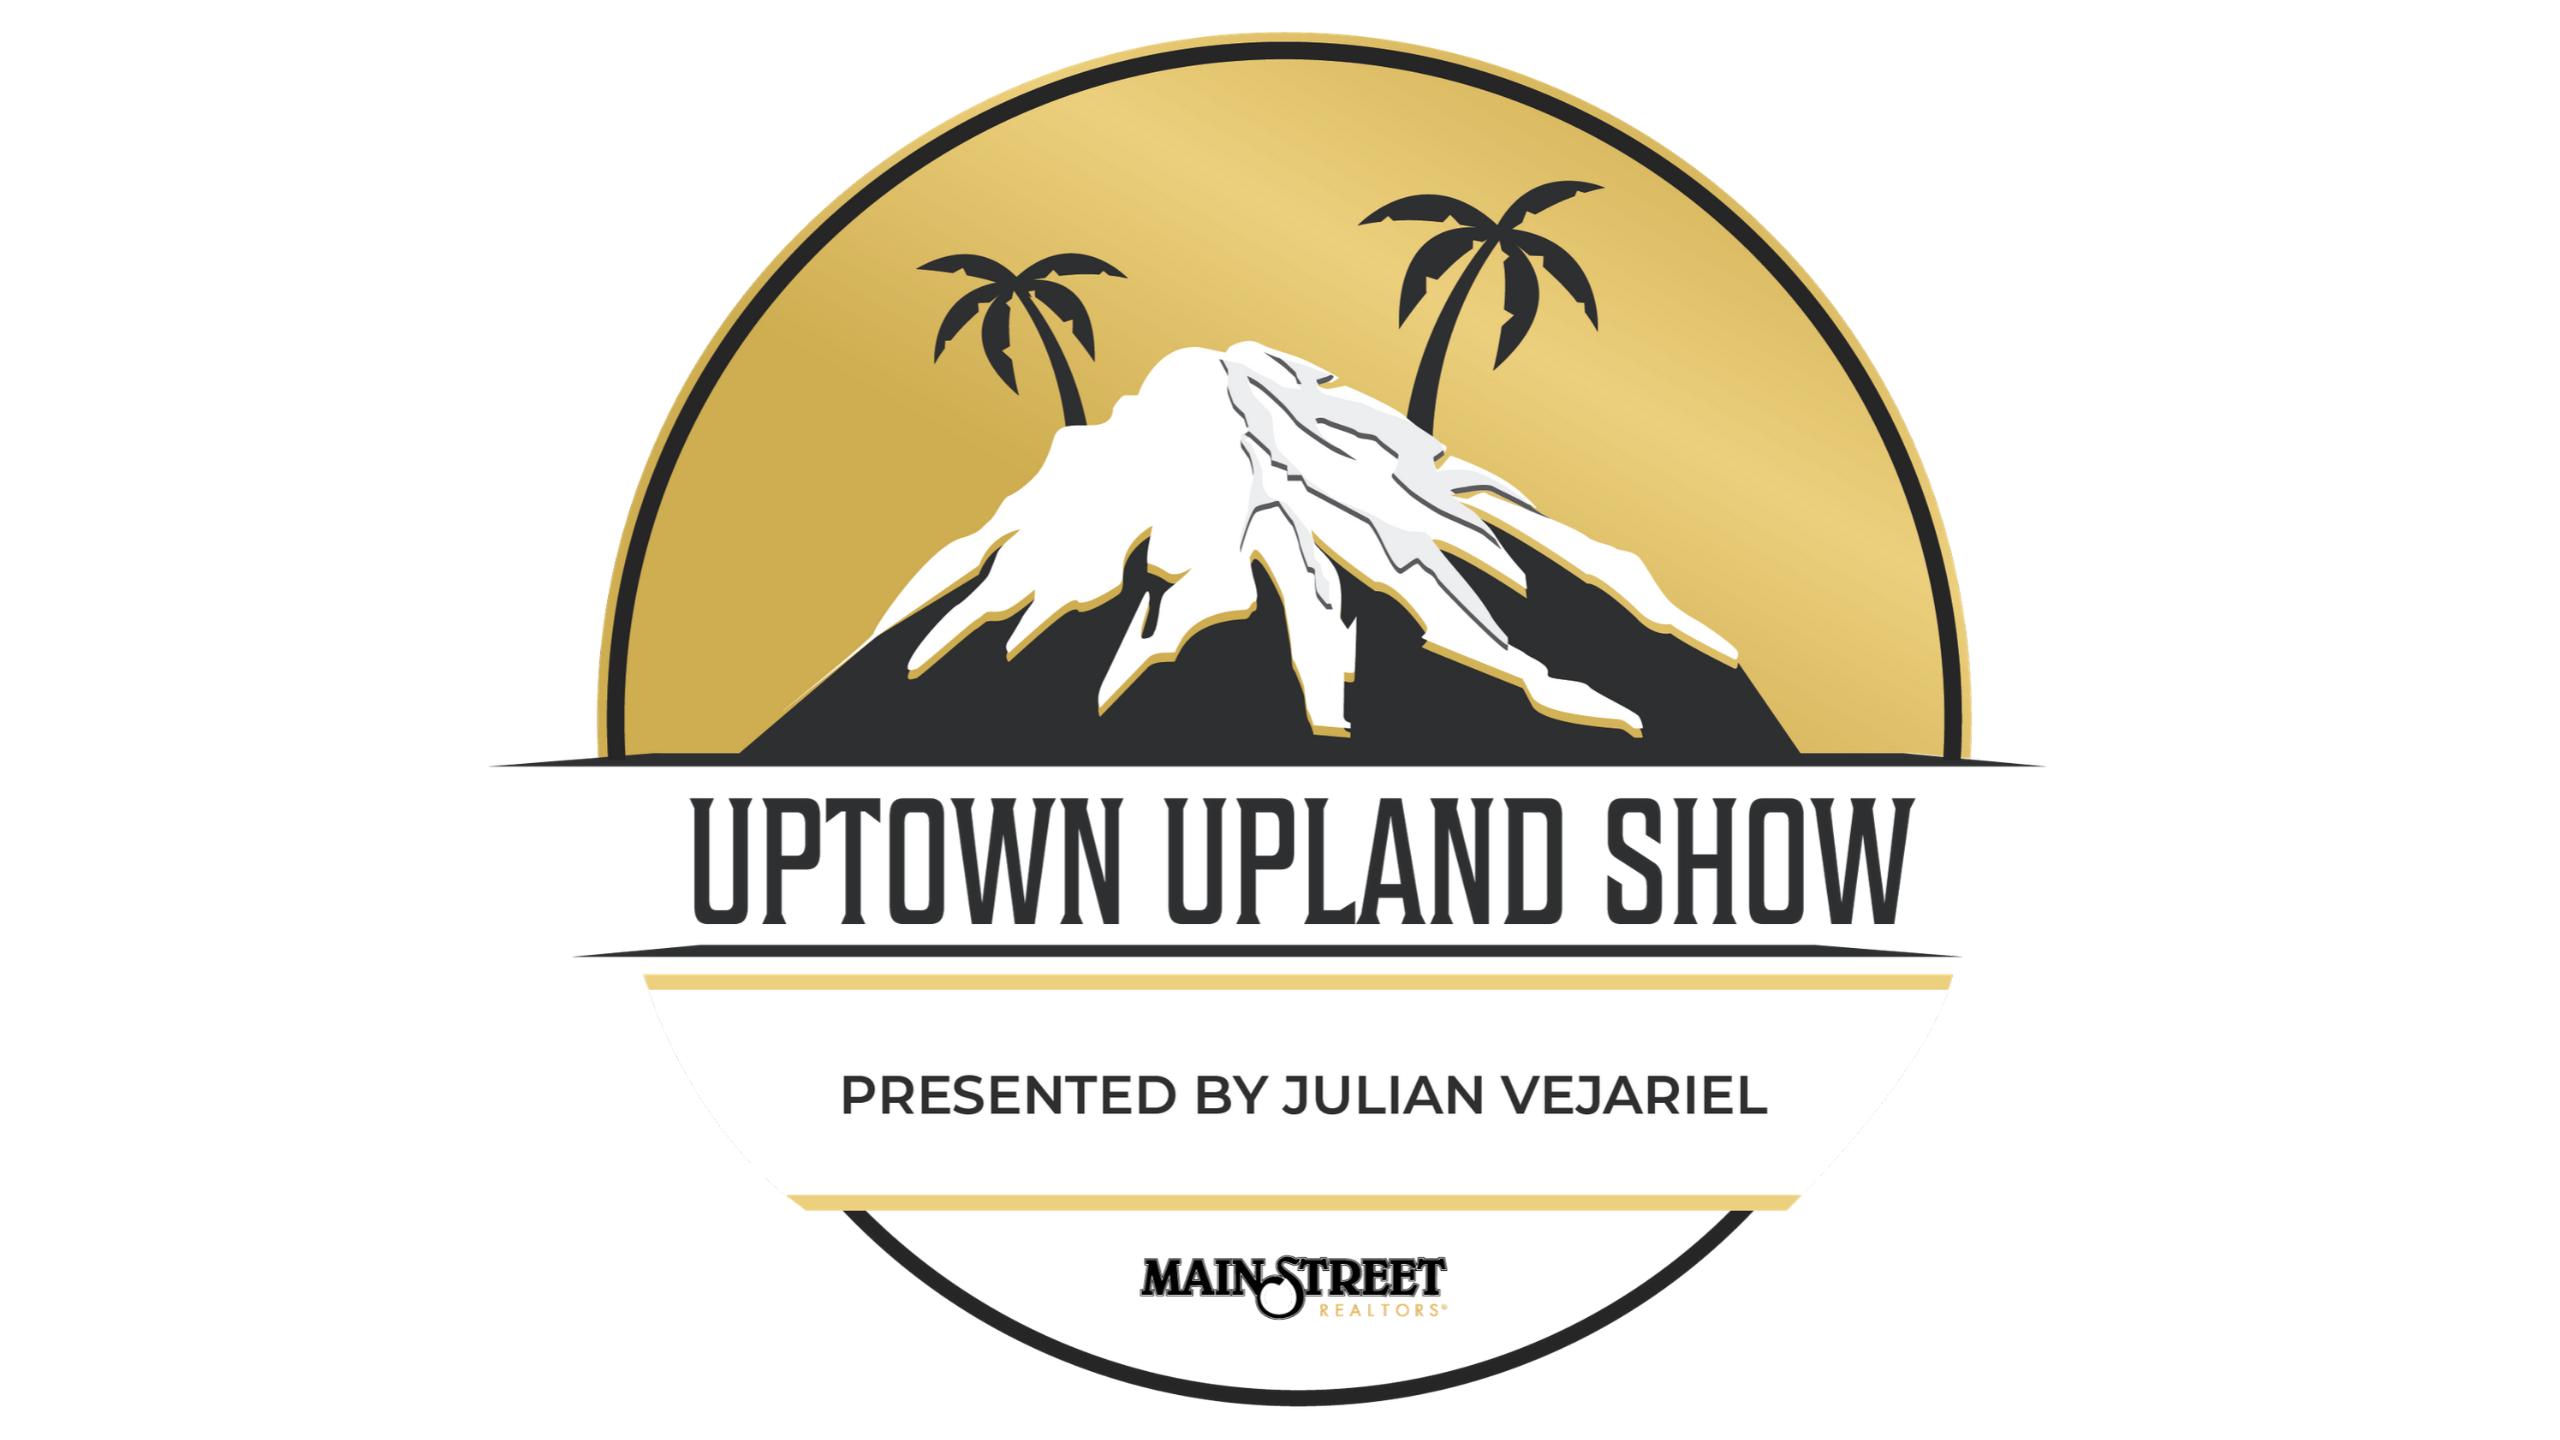 Uptown Upland Show; Upland Pizza Company